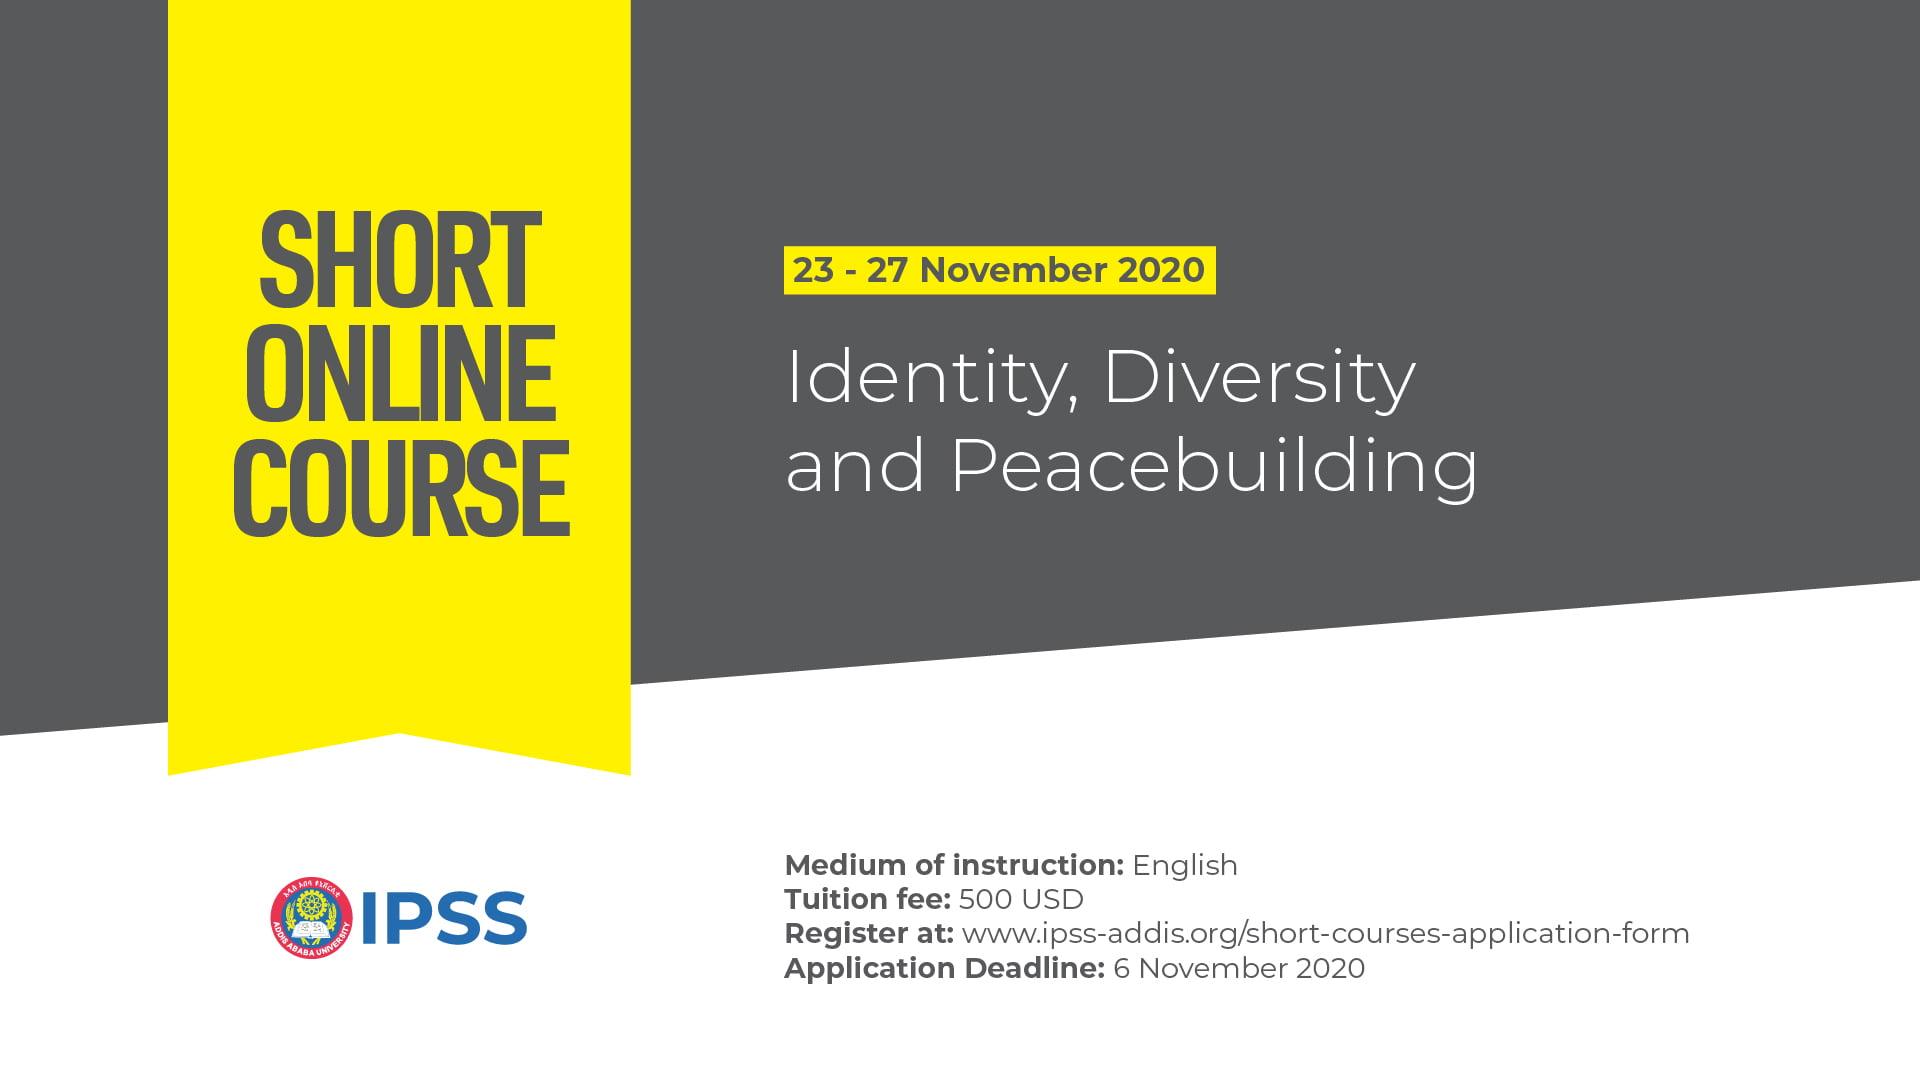 Short Course: Identity, Diversity and Peacebuilding